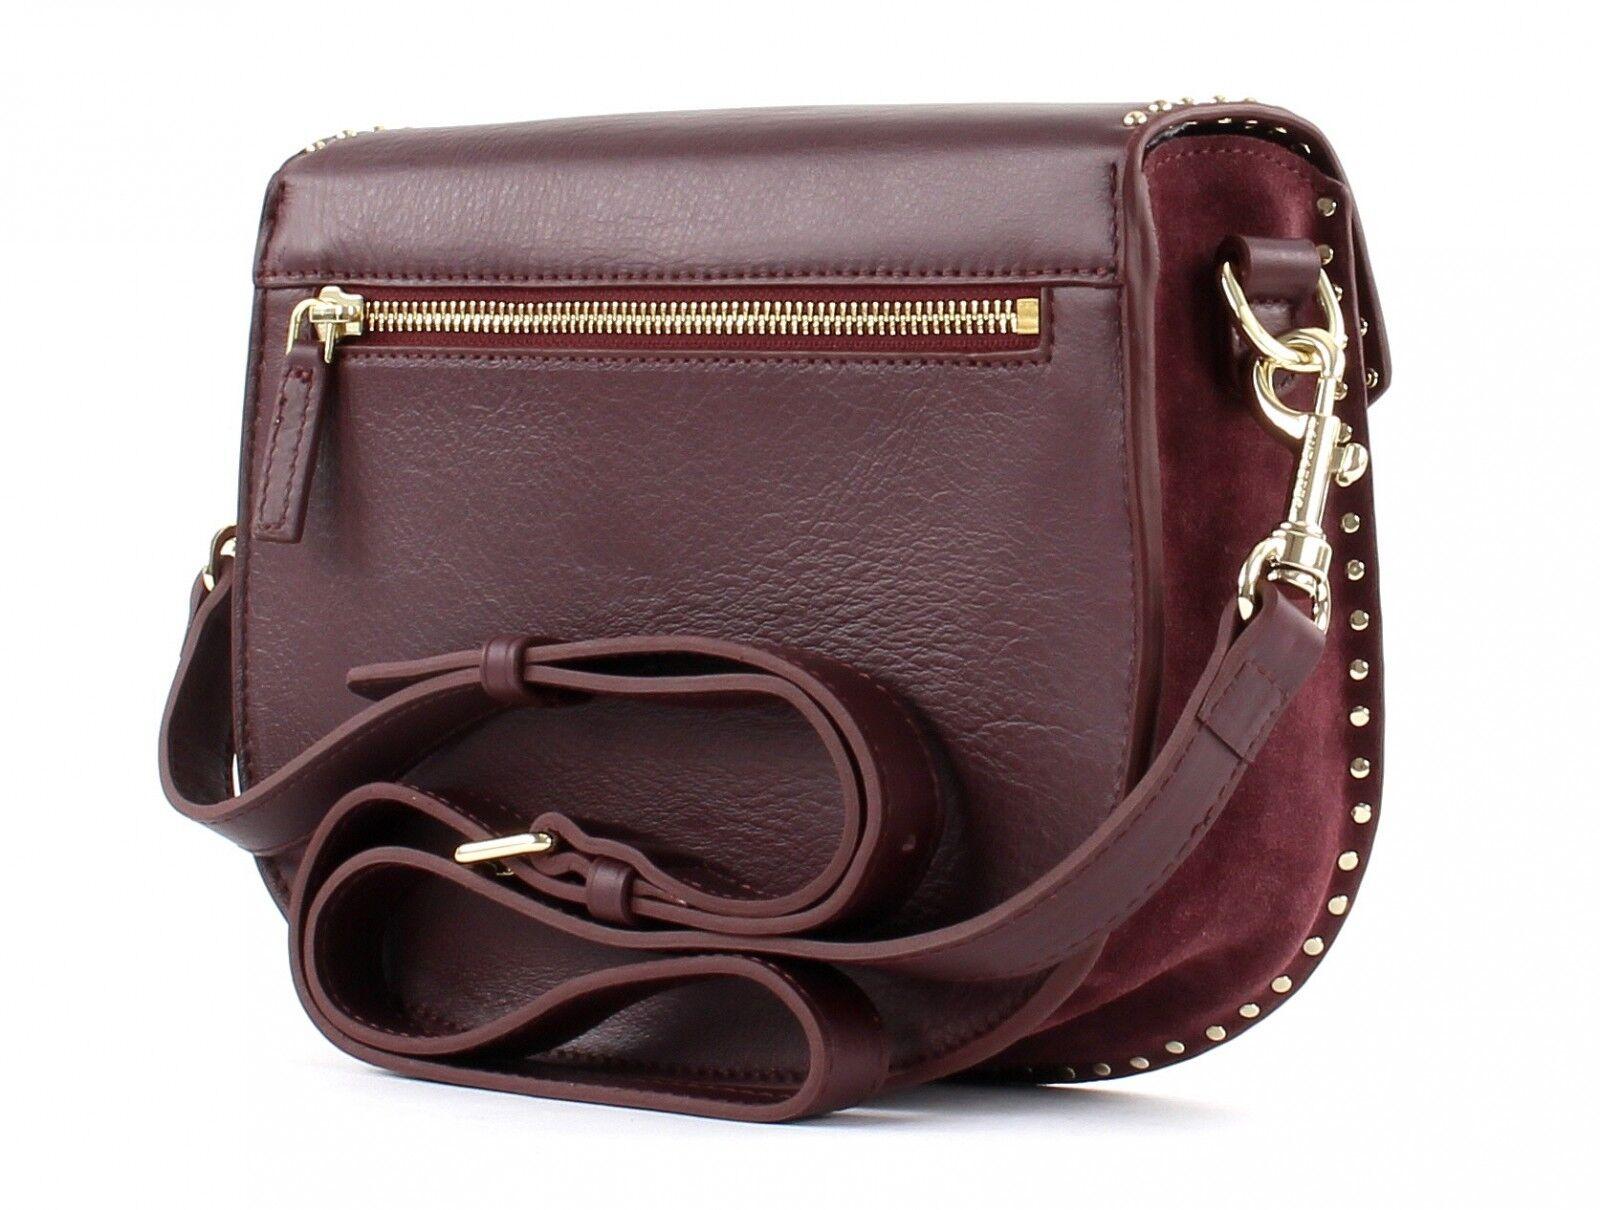 LANCASTER Mademoiselle Studs Shoulder Bag Umhängetasche Tasche Bordeaux Bordeaux Bordeaux lilat | Kompletter Spezifikationsbereich  | Moderne Technologie  | Moderne Technologie  dcd199